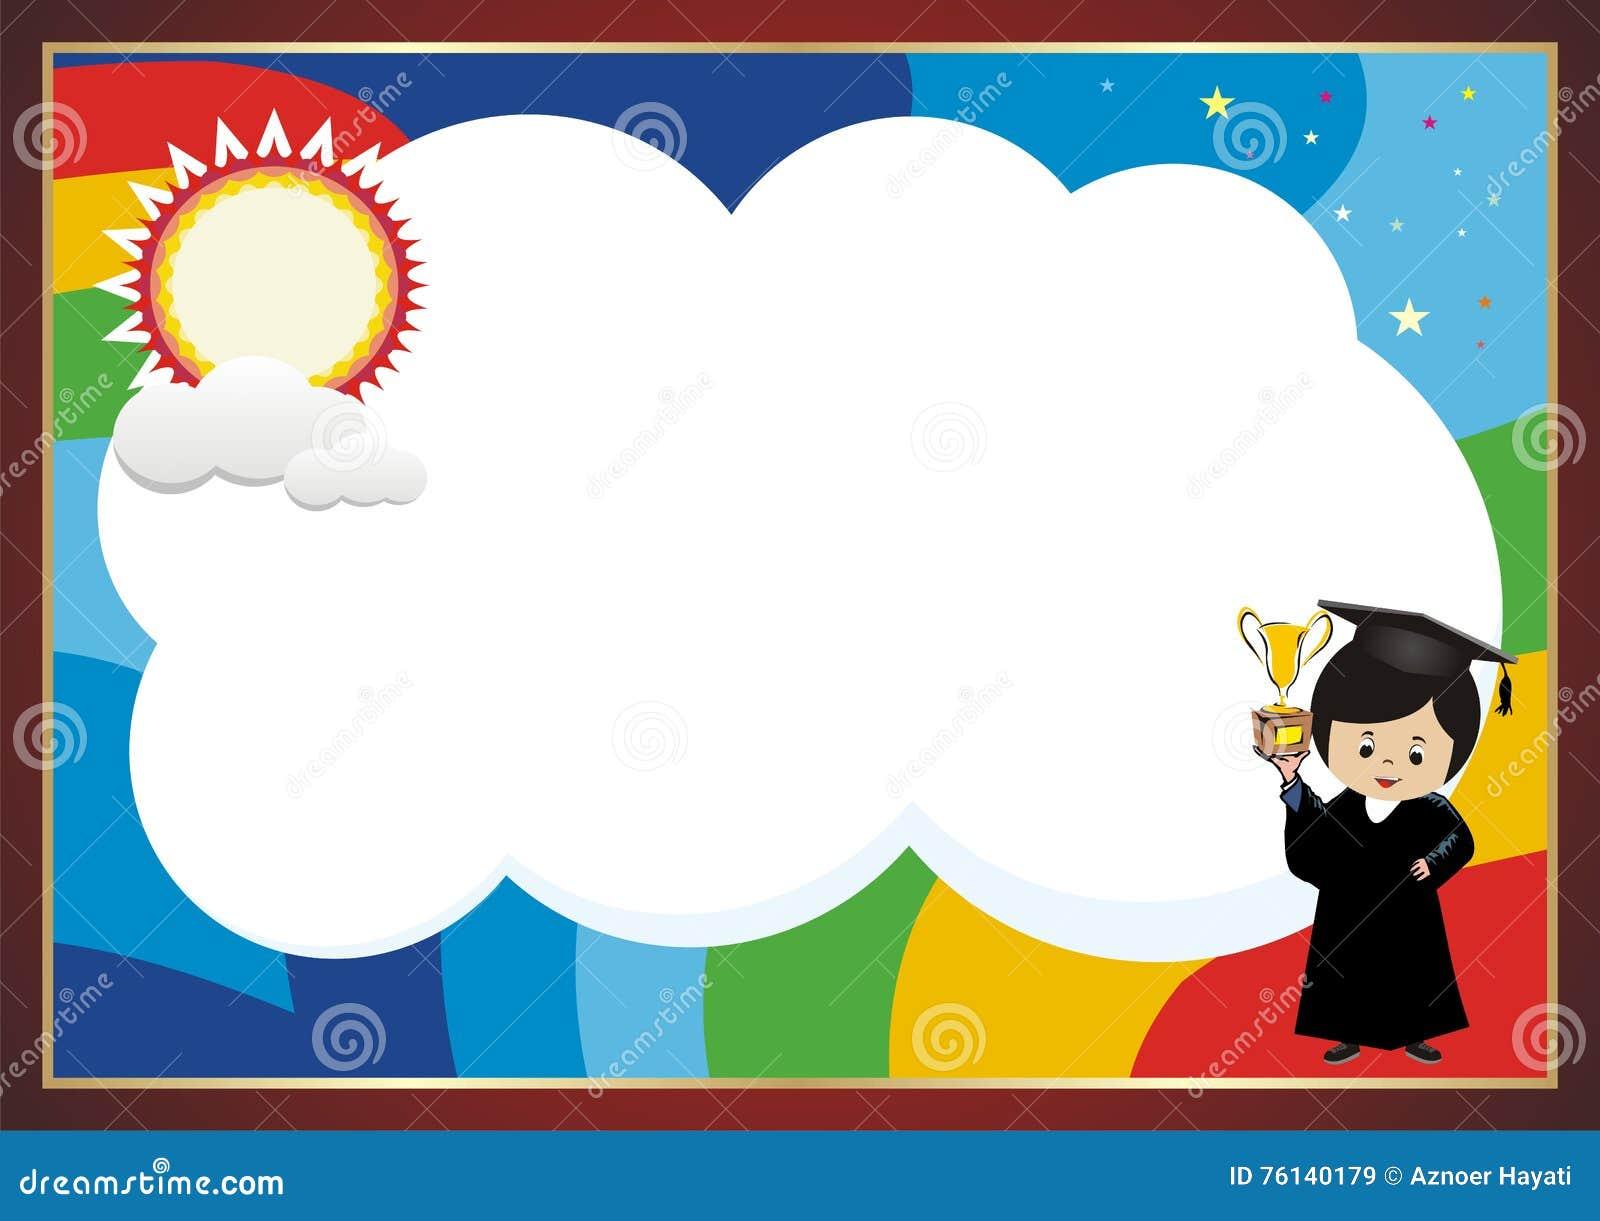 Kindergarten, Kid Diploma With Rainbow Background Stock ...  Kindergarten, K...